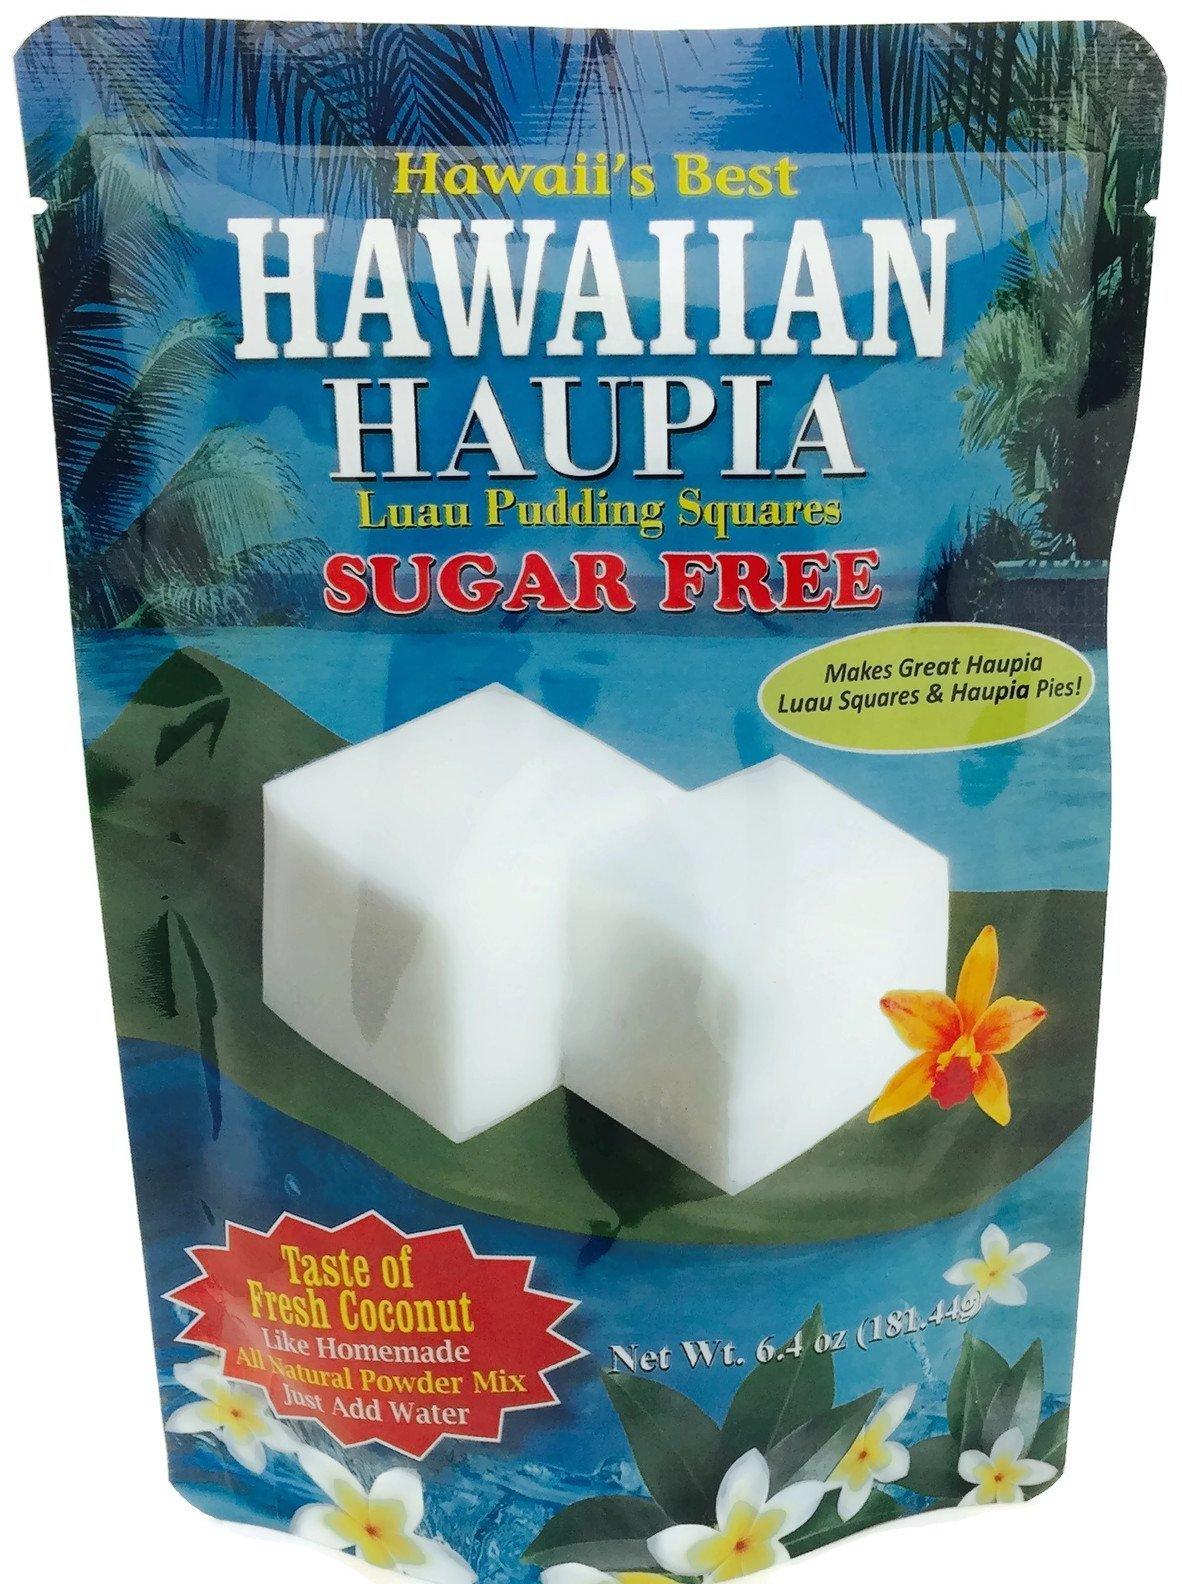 Kauai Tropical Syrup Sugar Free Hawaiian Haupia Luau Pudding Squares, 6.4 Ounce